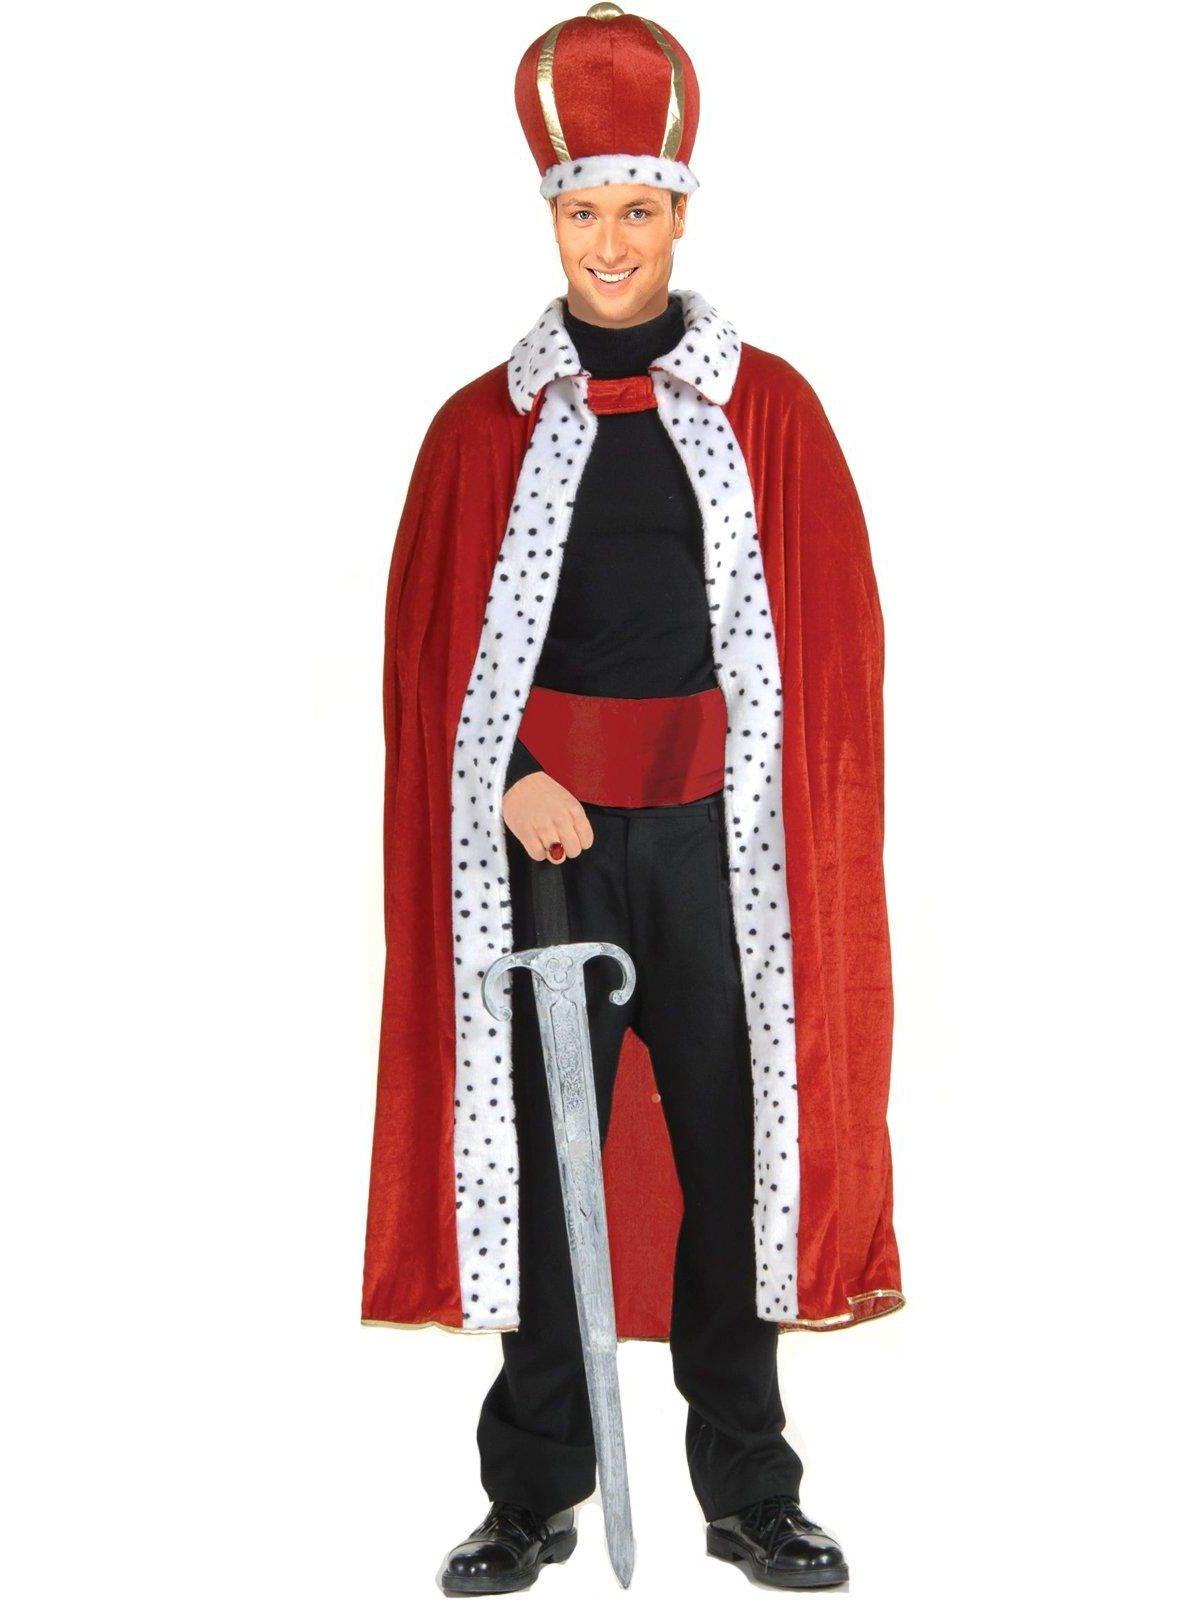 King Robe & Crown Adult Costume Kit